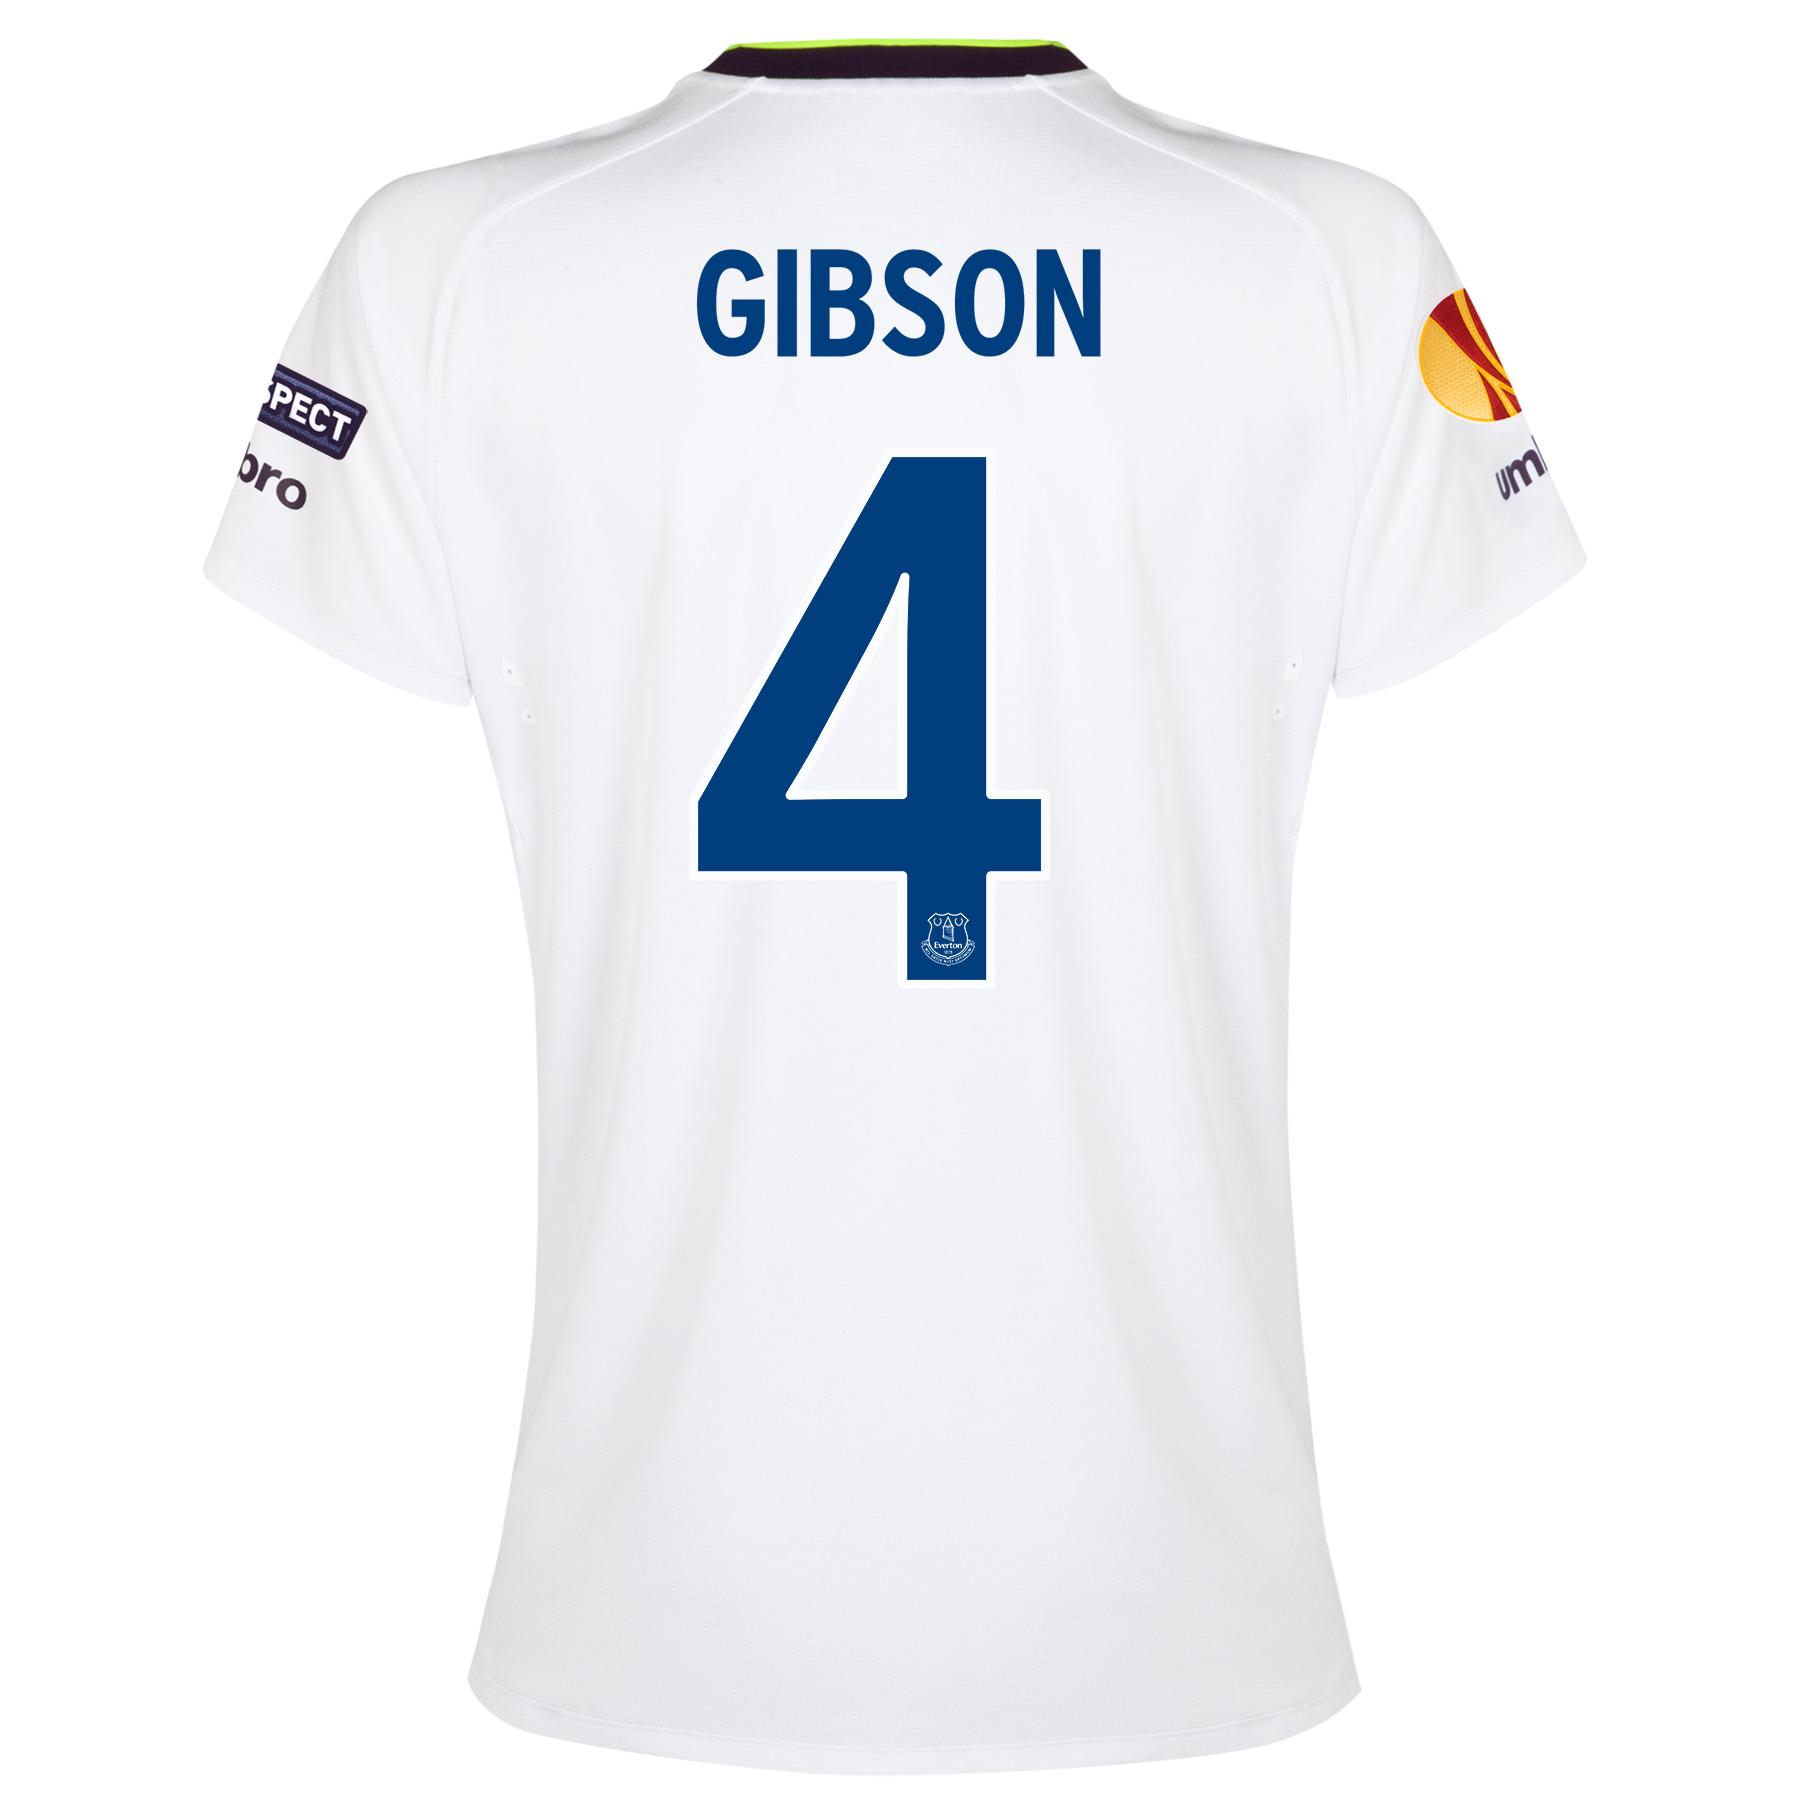 Everton UEFA Europa League 3rd Shirt 2014/15 - Womens with Gibson 4 pr